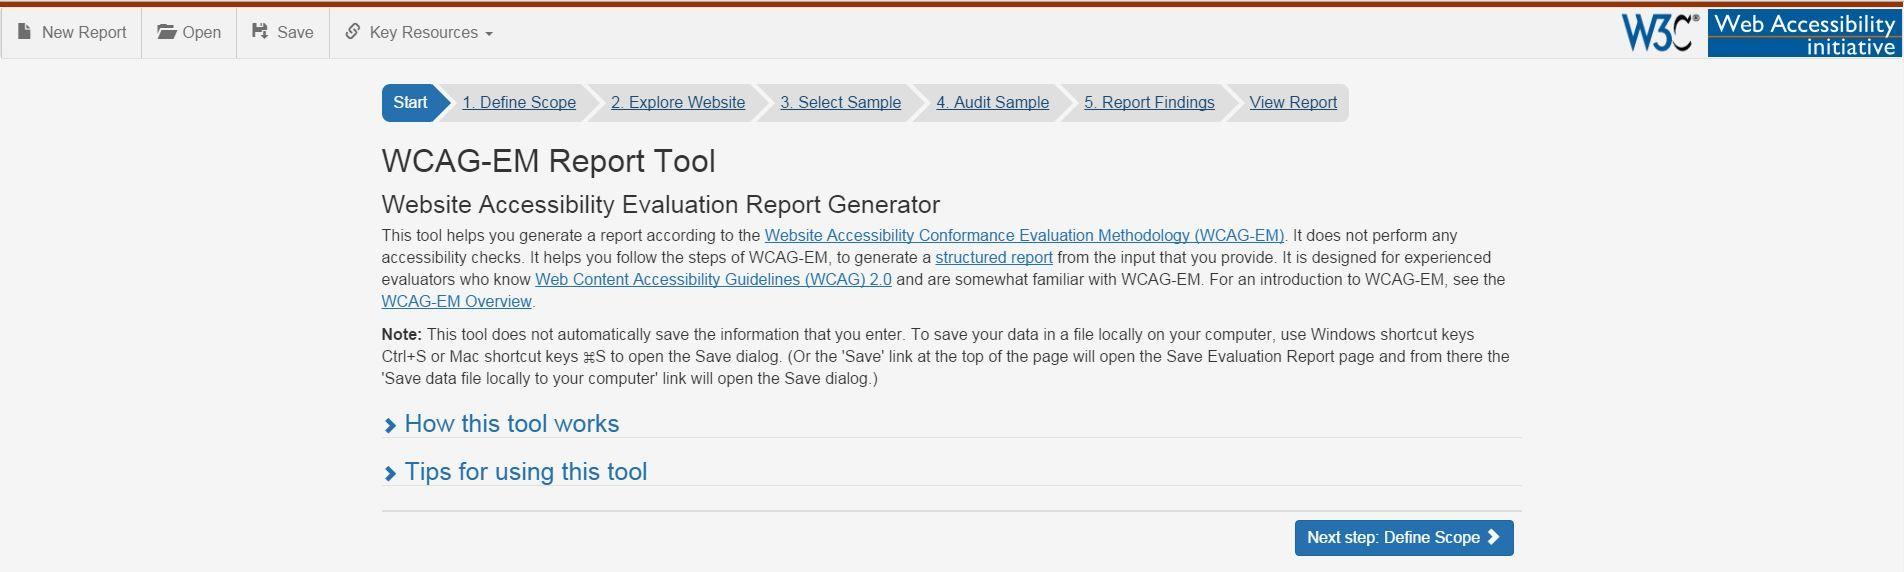 WcagEm Report Tool Website Accessibility Evaluation Report